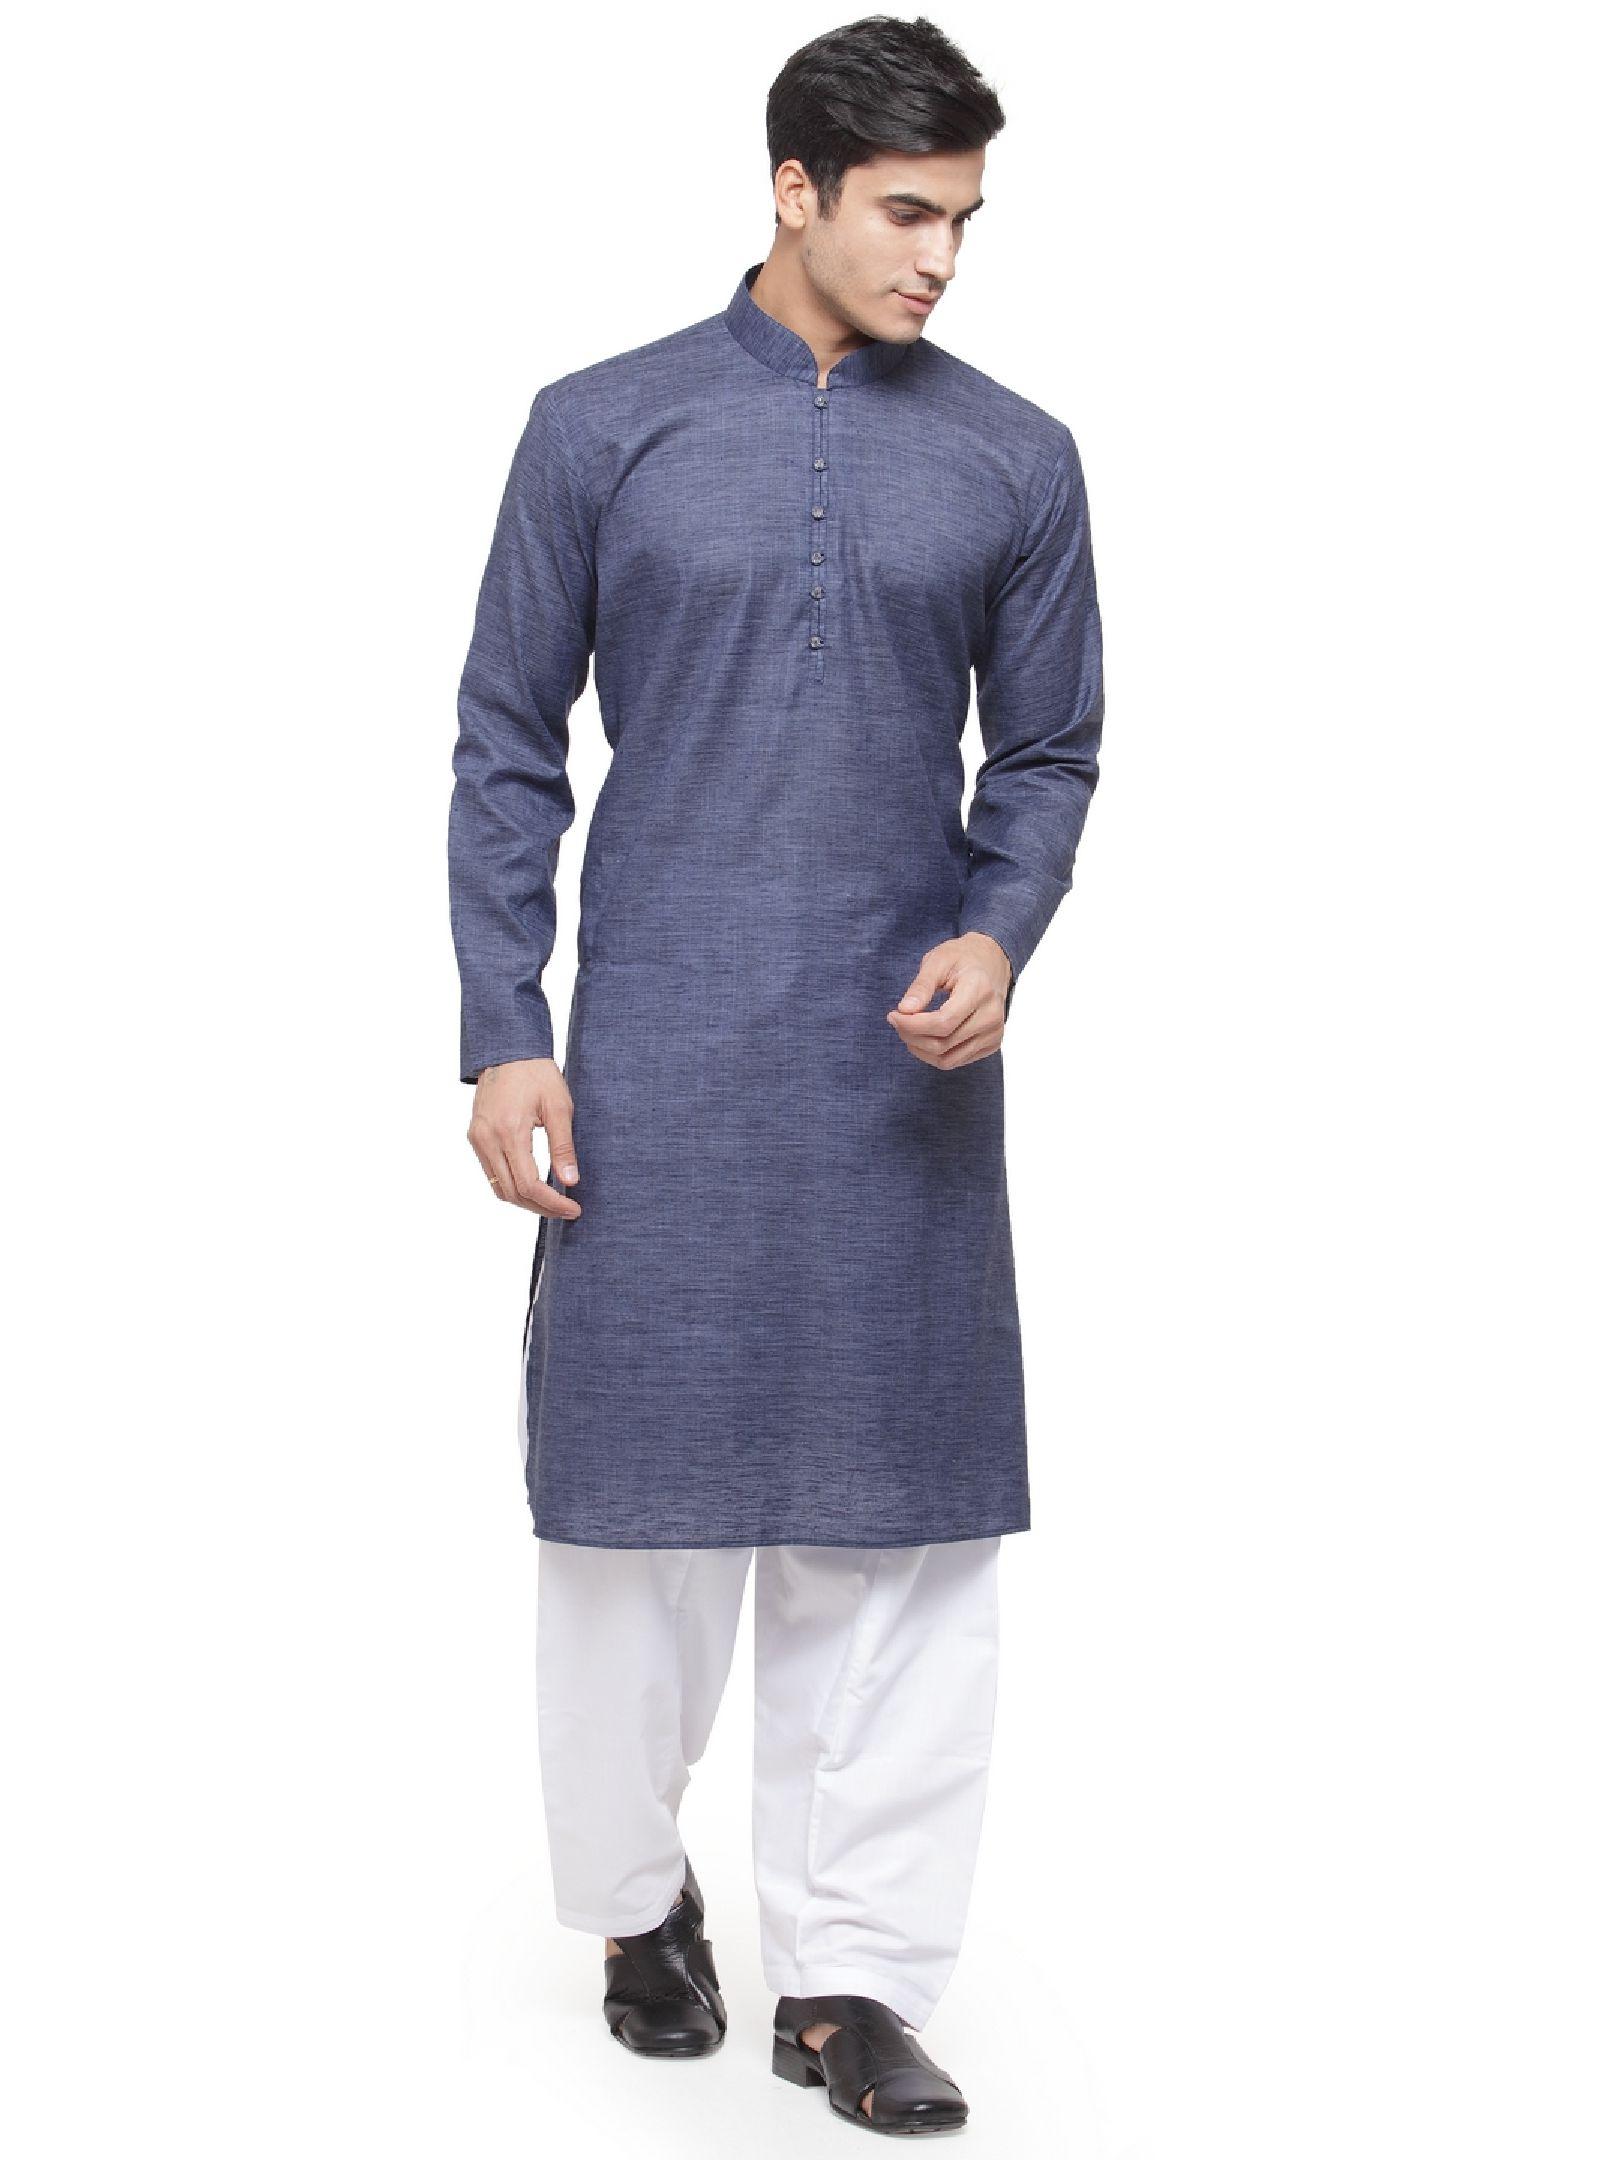 RG Designers Purple Cotton Kurta Pyjama Set